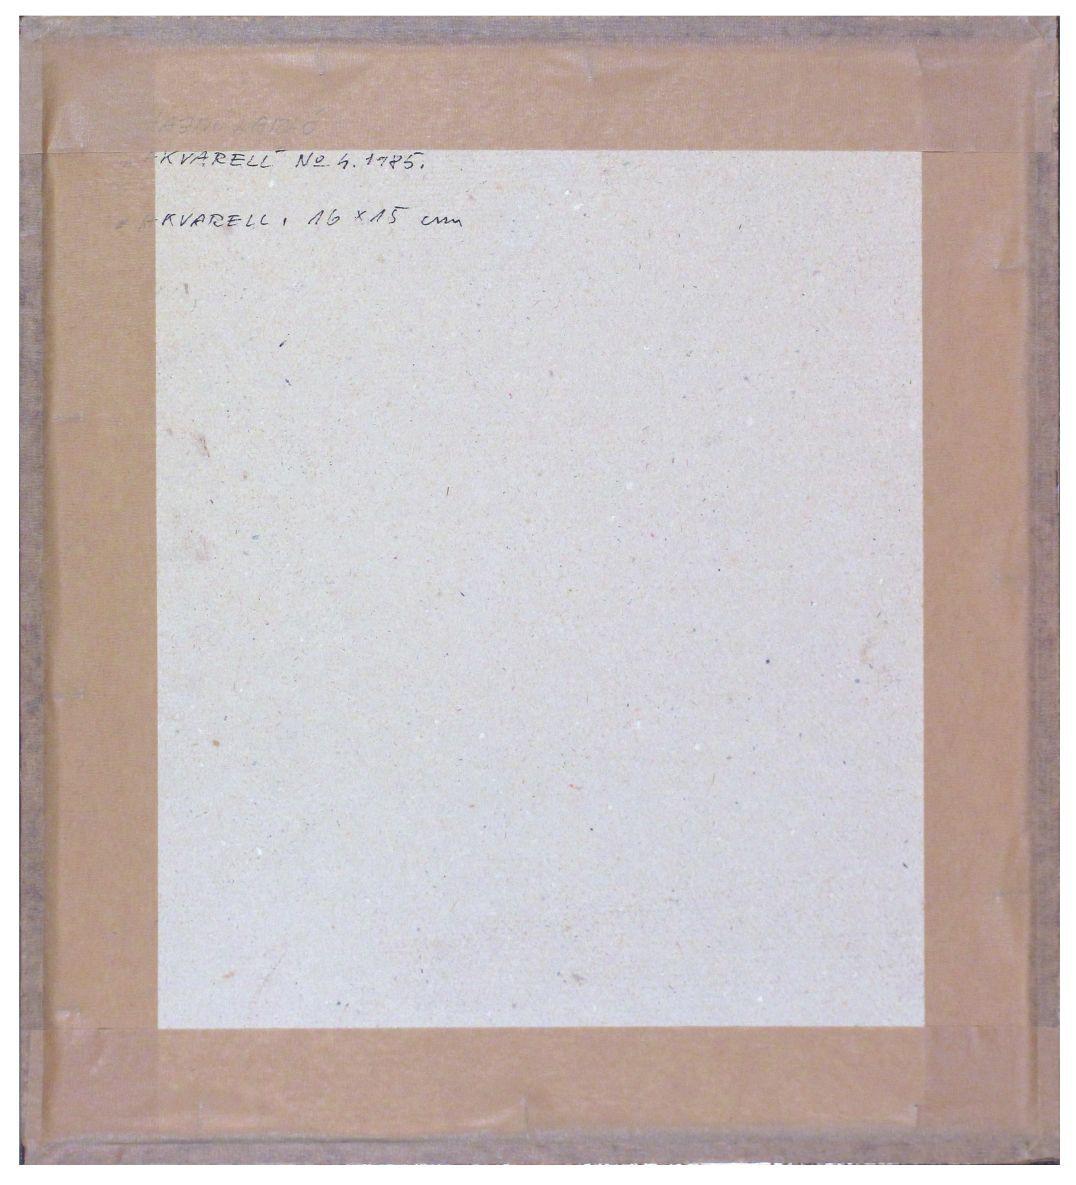 IMG_5789.JPG (1076×1185)